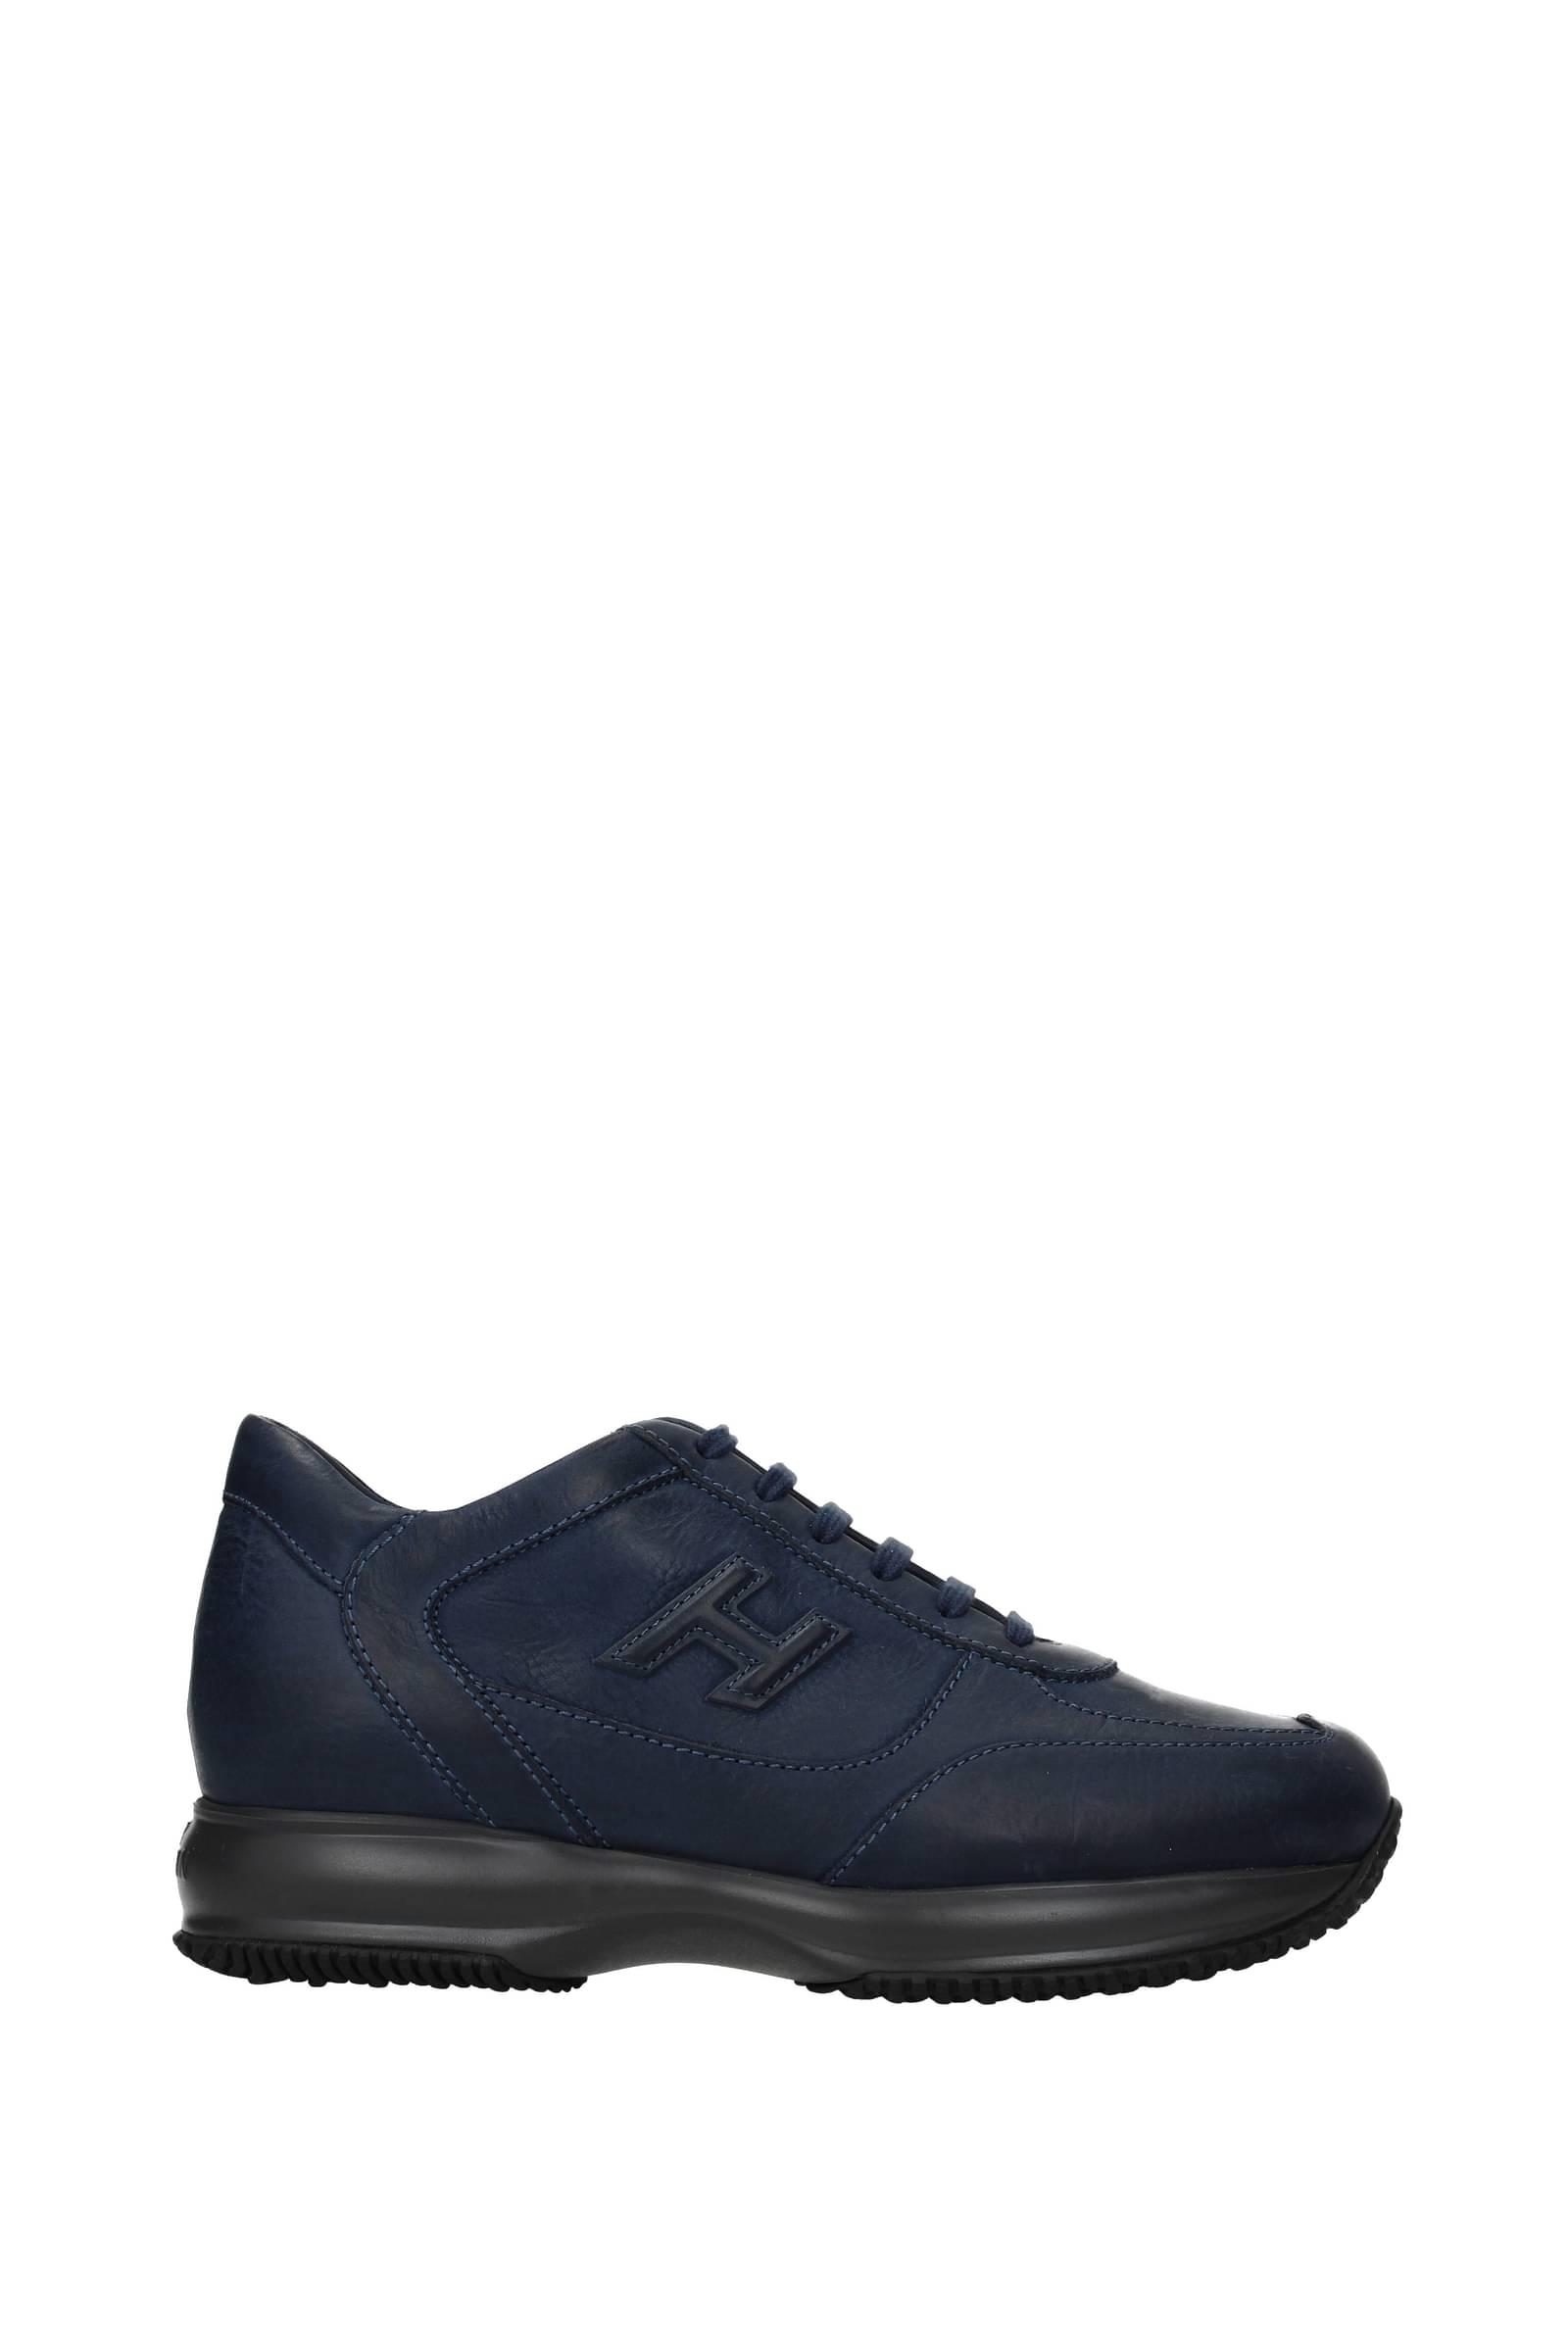 Hogan Sneakers interactive Uomo HXM00N0I980PX6U820 Pelle 191,1€